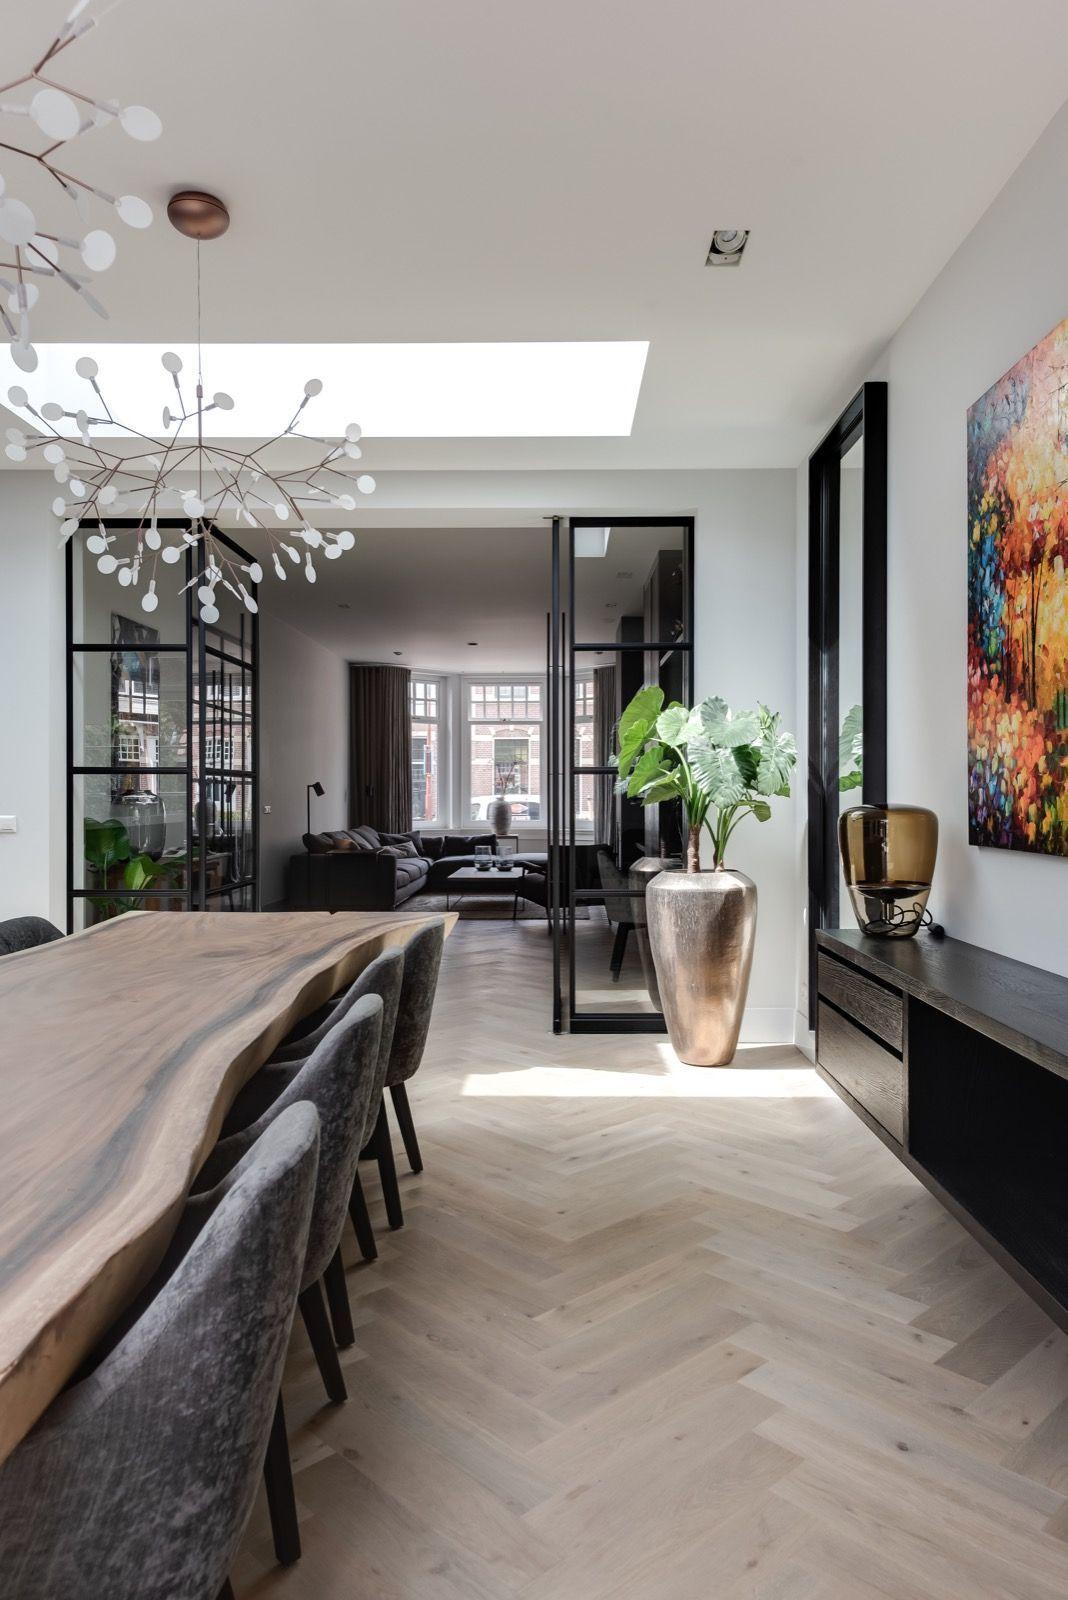 Interior Design Wohnzimmer #inspiratie #nägels #nägelsinspiratie